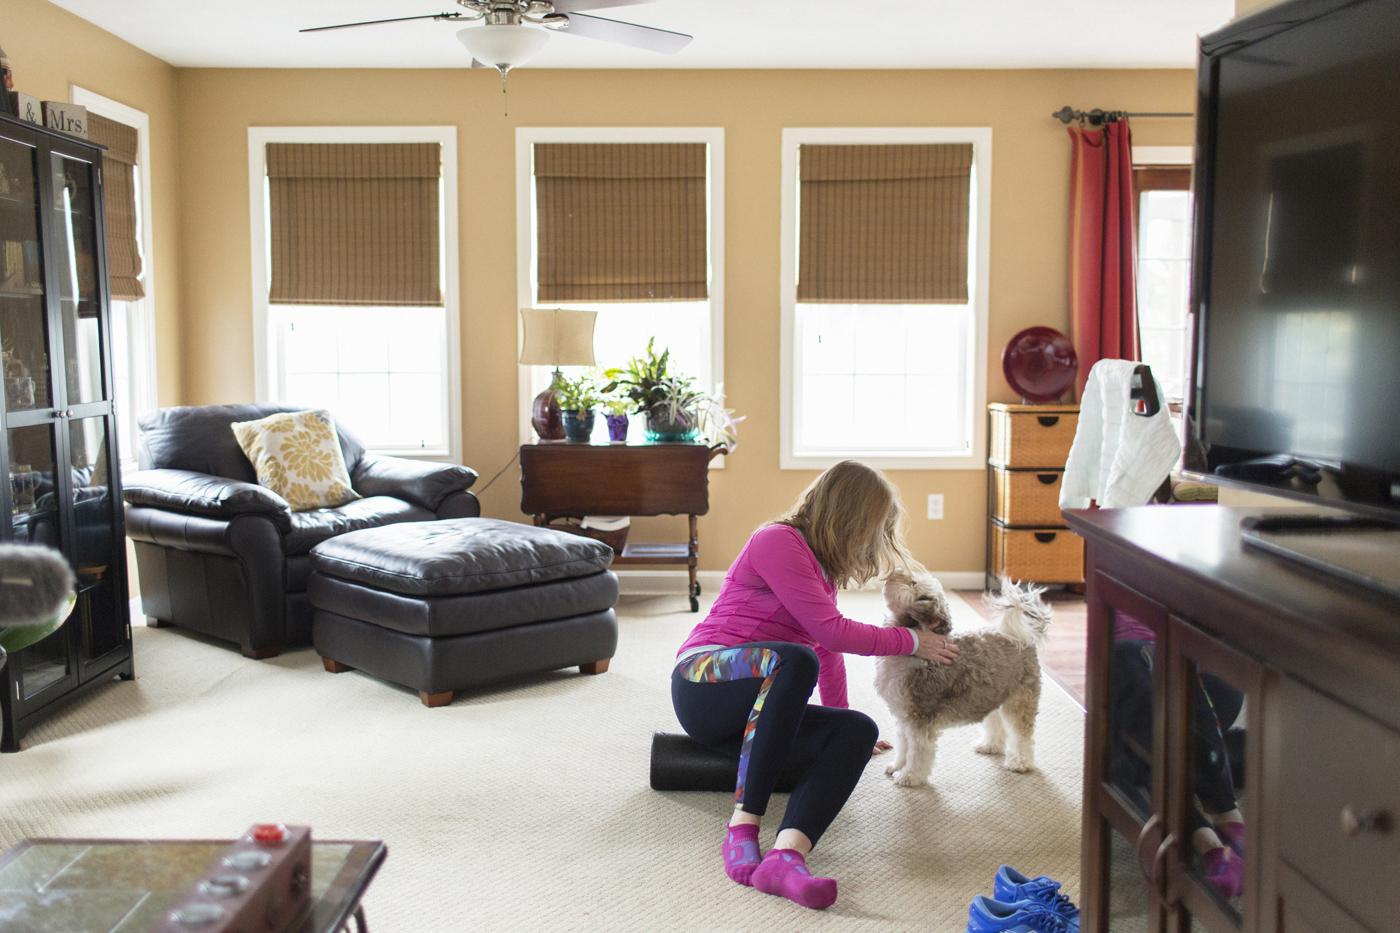 Faith inside her house, petting her dog.